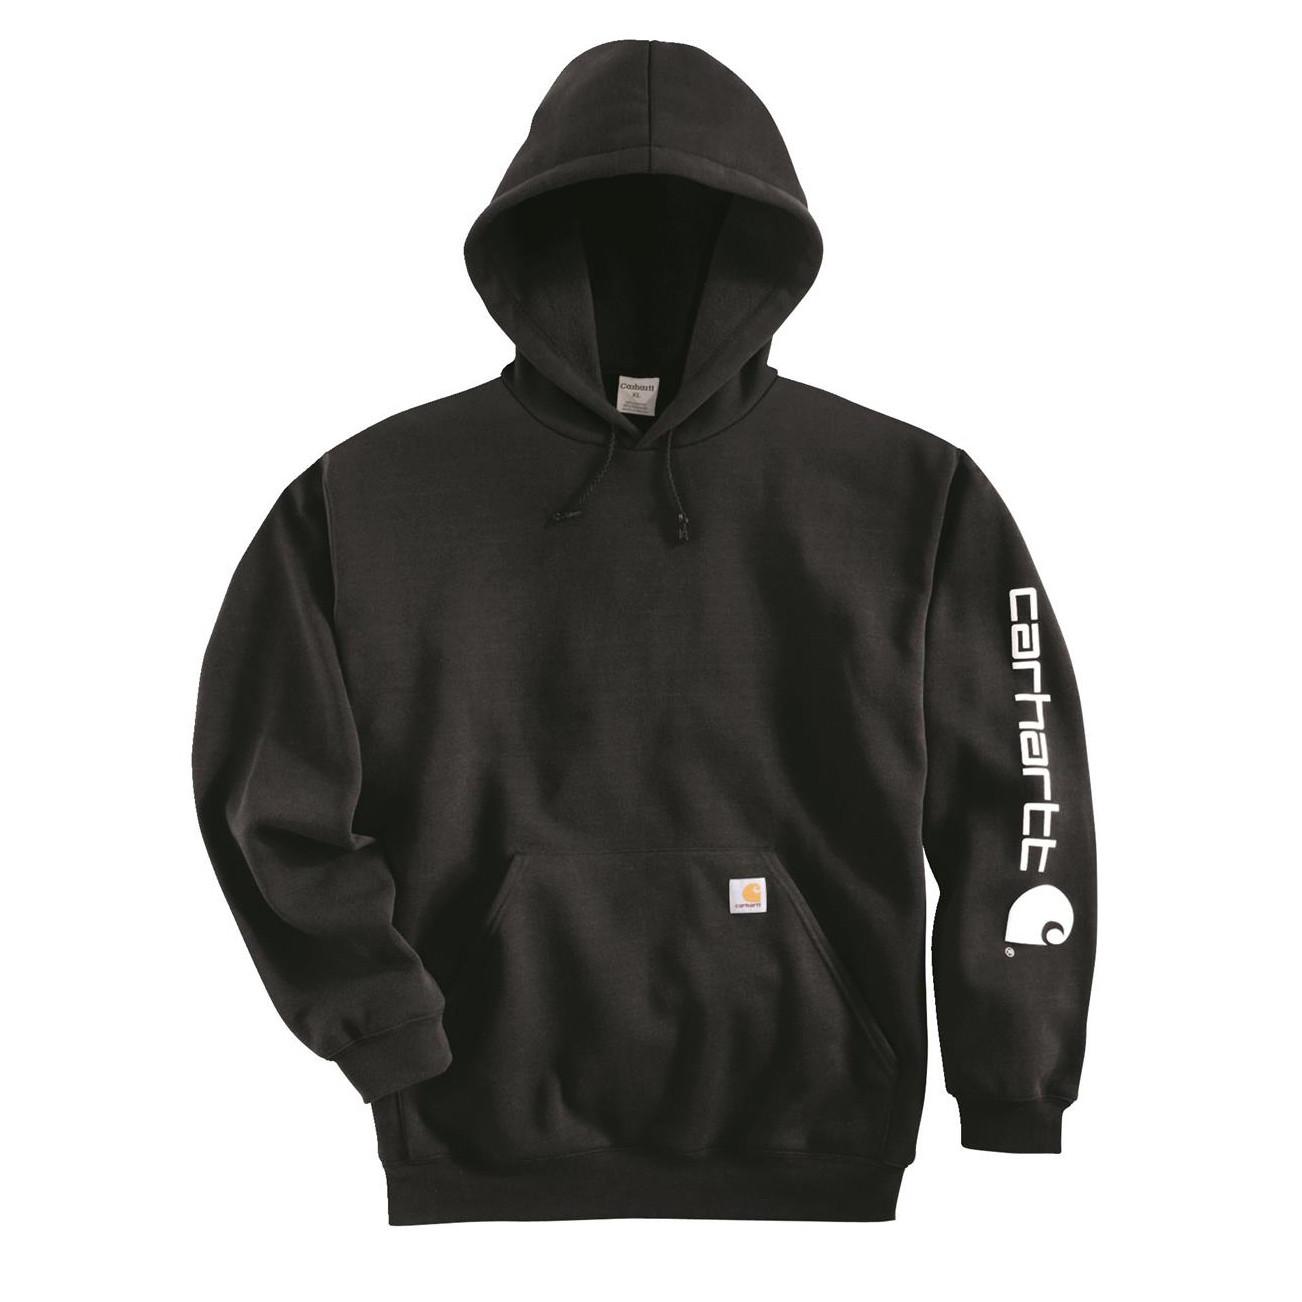 Худи Carhartt Sleeve Logo Hooded Sweatshirt - K288 (Dark Brown, M)